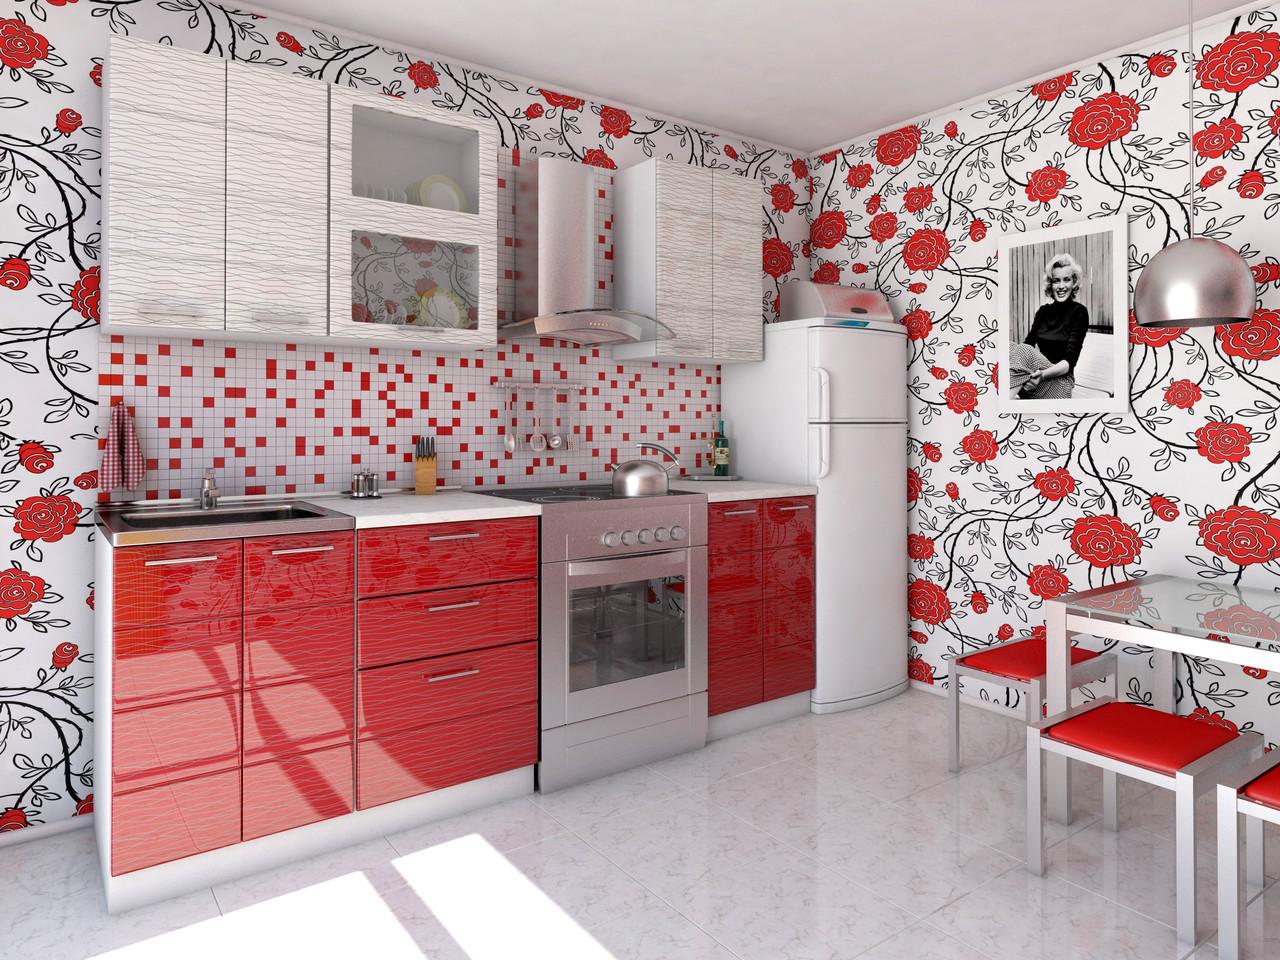 Red Tiles Design For Kitchen Rumah Joglo Limasan Work